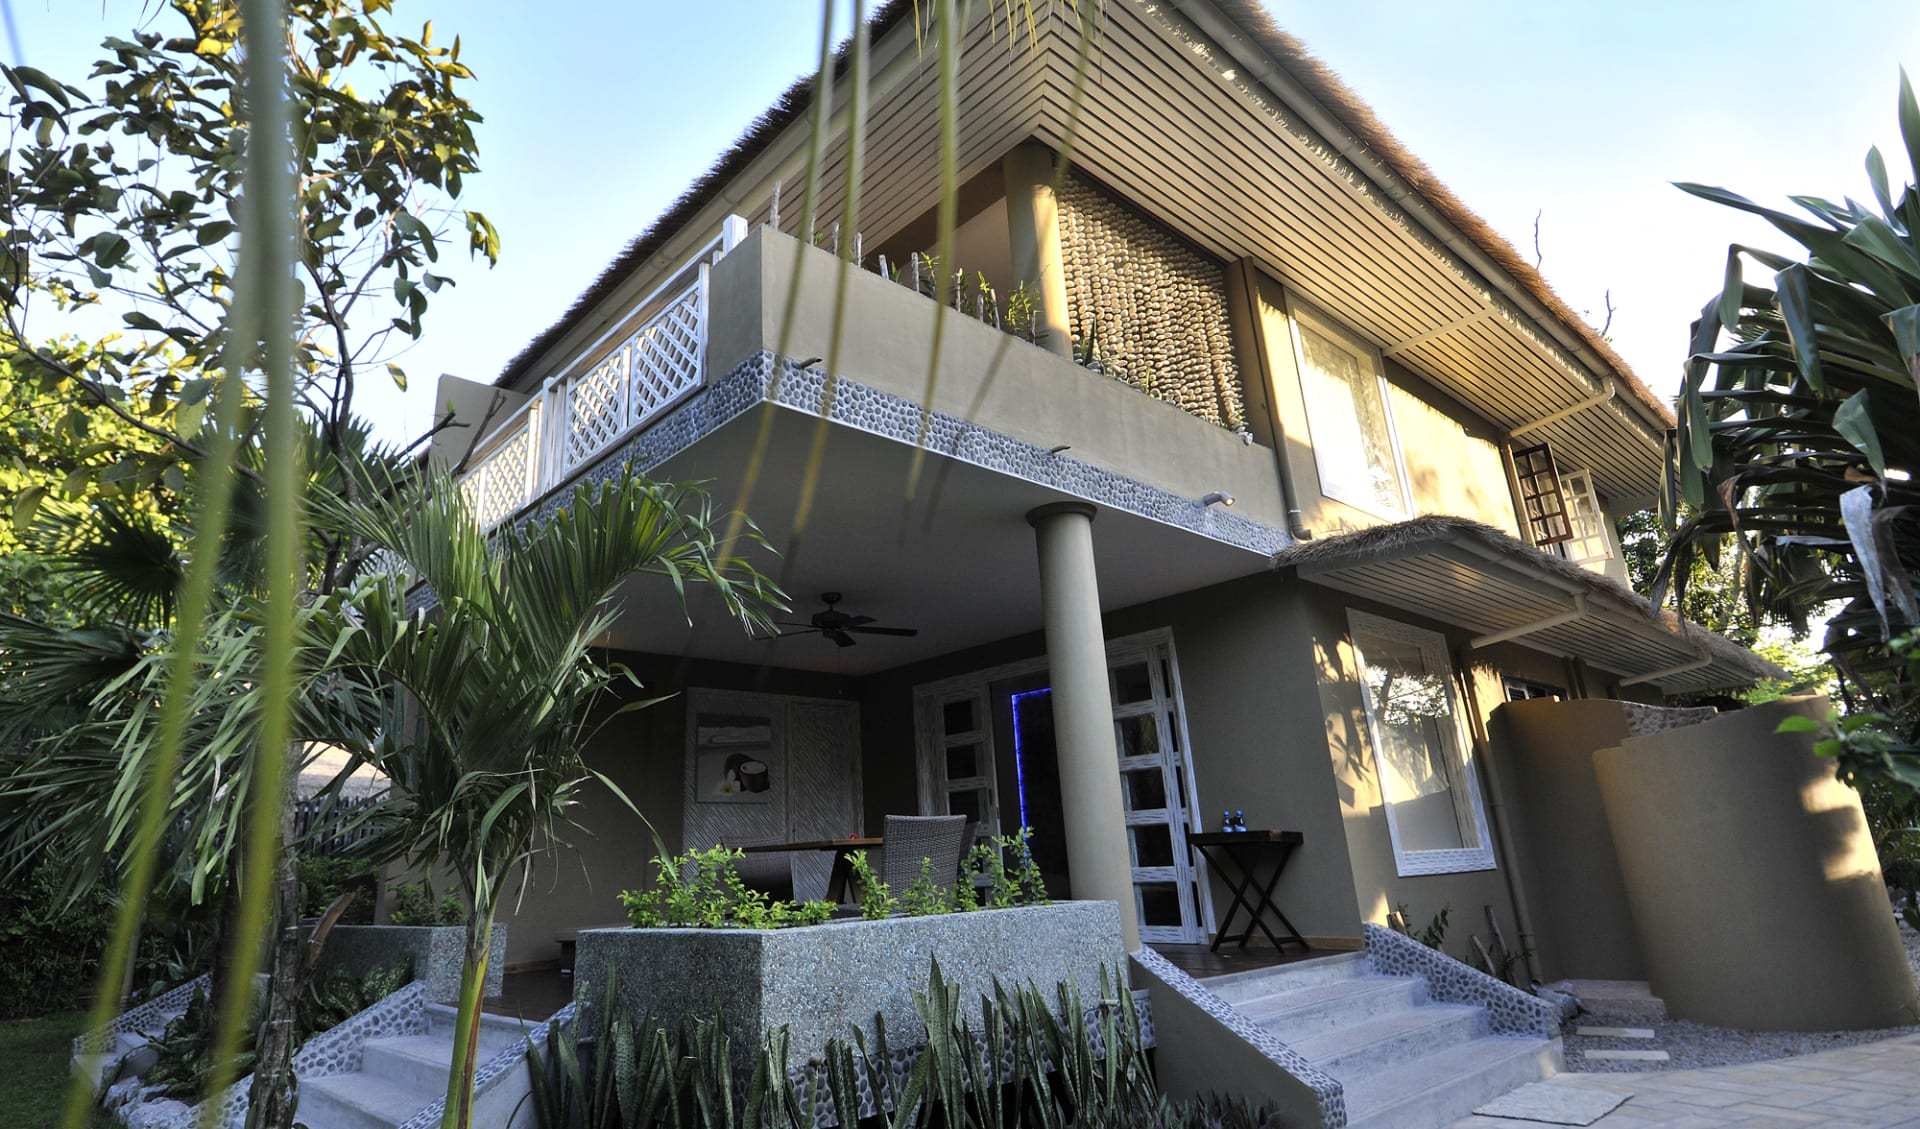 Le Domaine de l'Orangeraie in La Digue:  Garden Villa